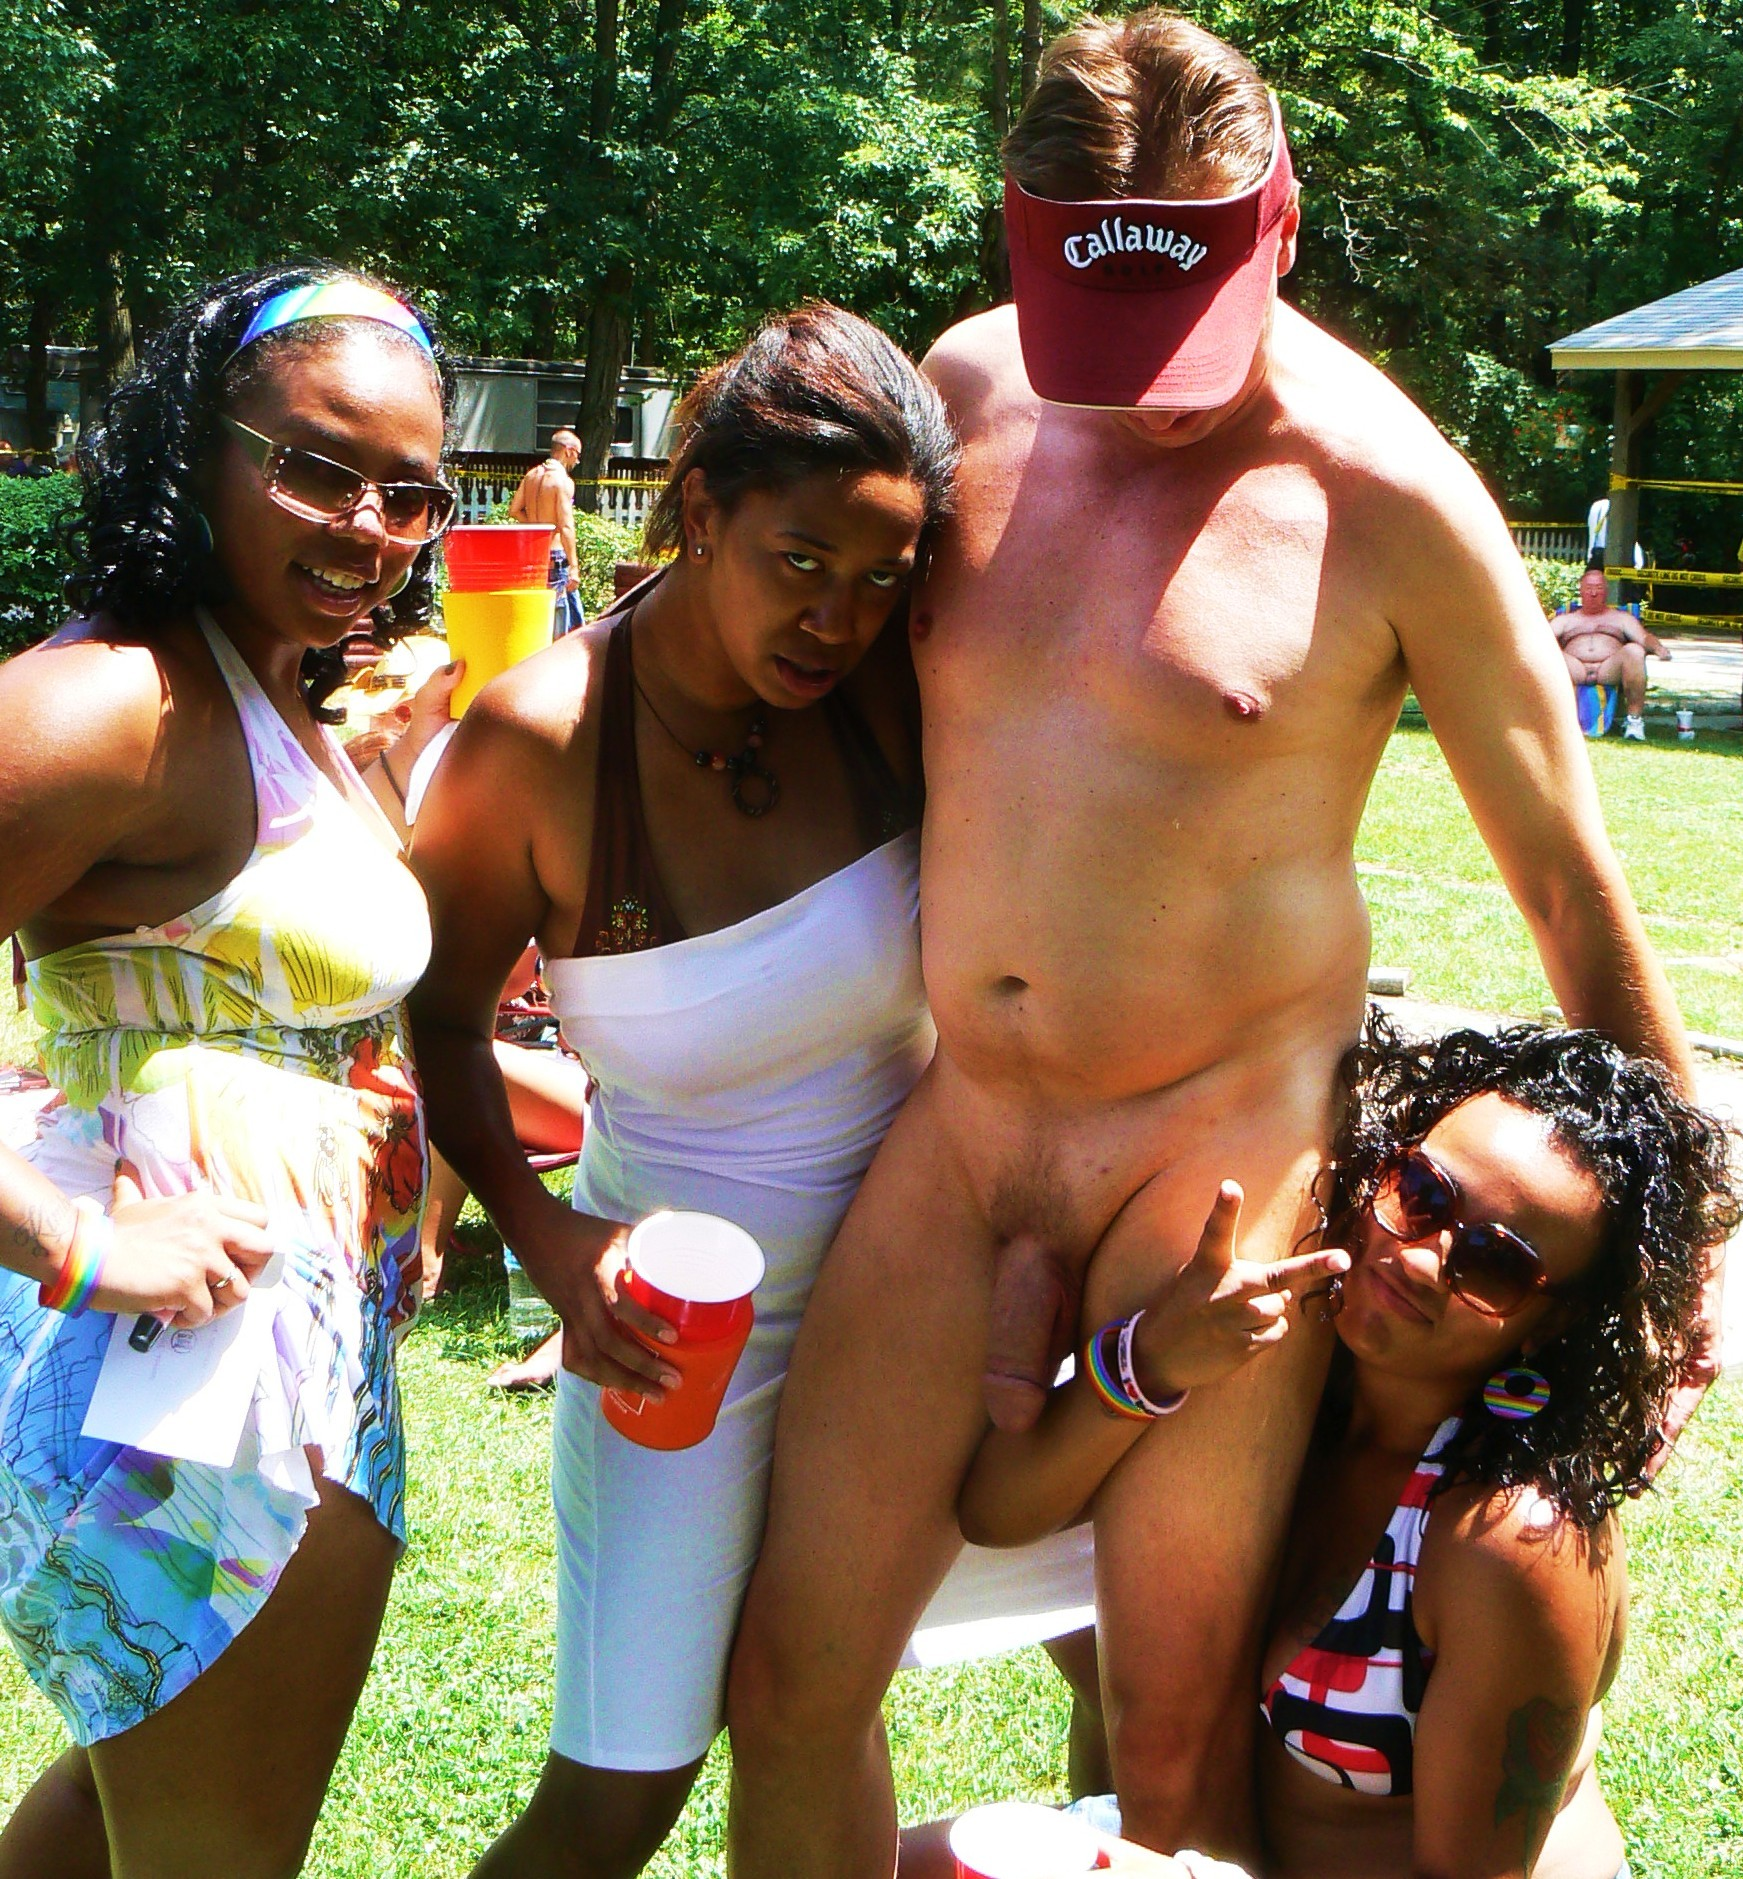 Nudes a poppin ponderosa sun club